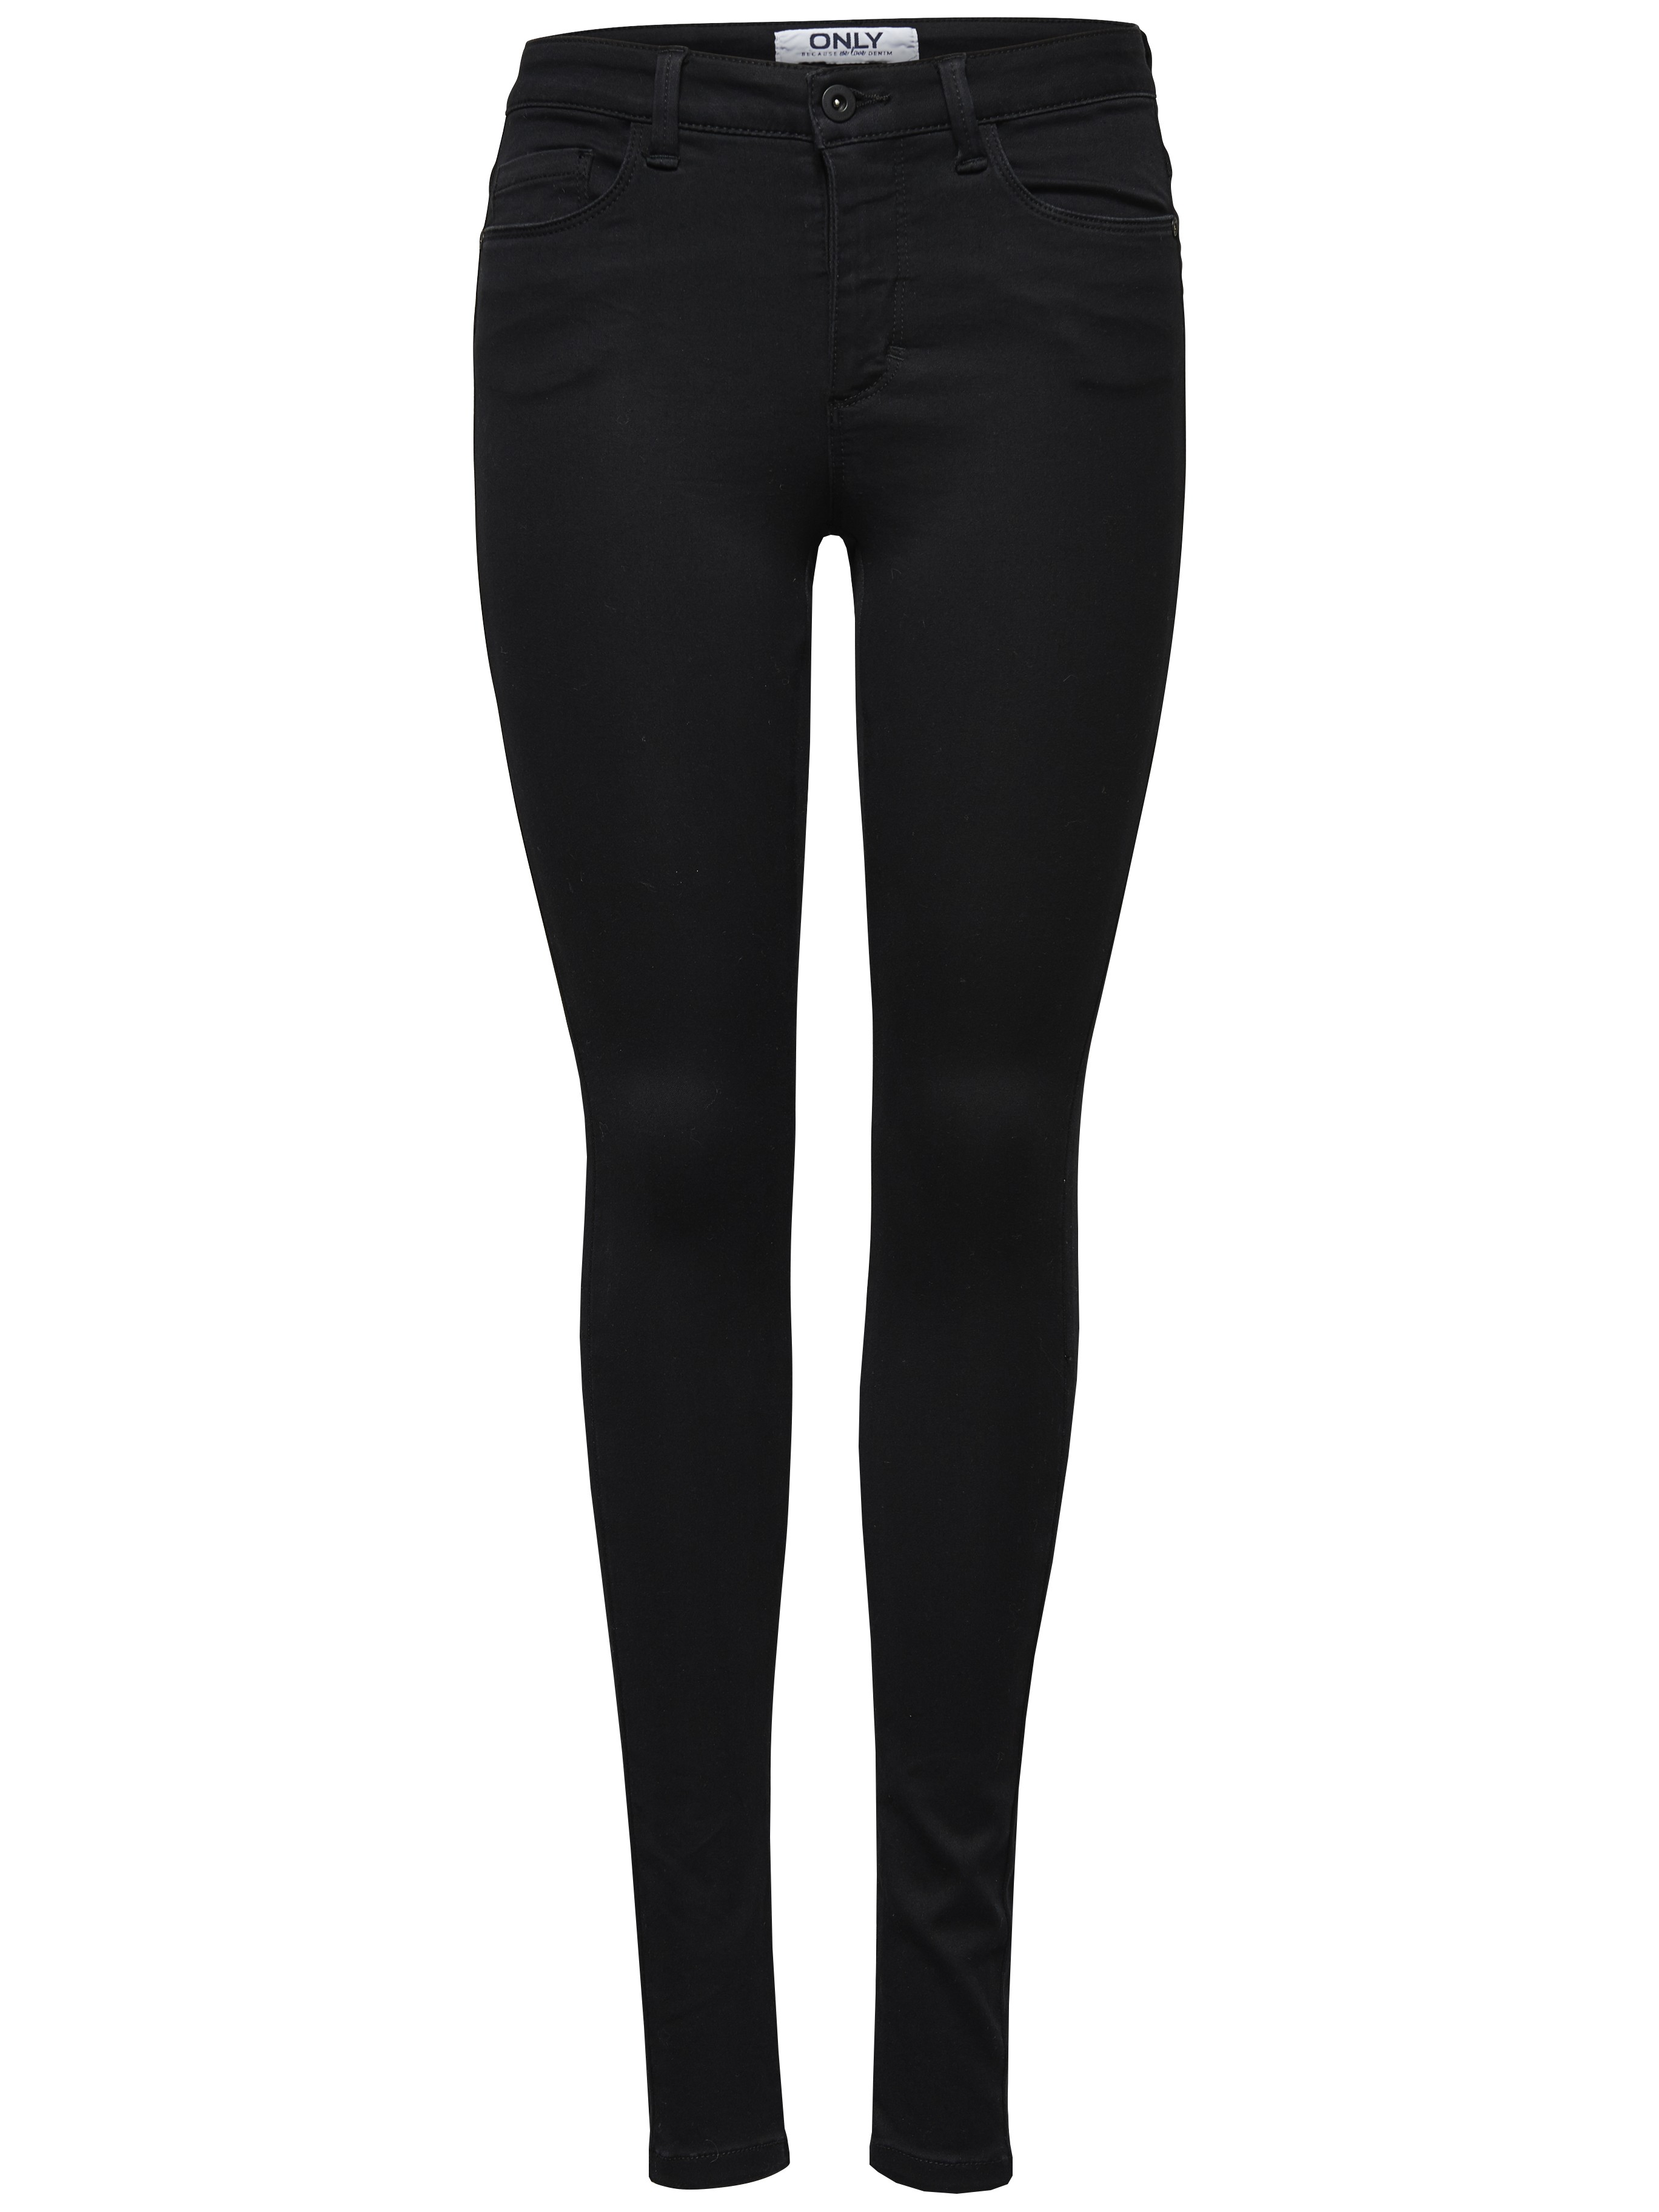 45b1d3abe826 ONLY Damen Jeans Leggings onlROYAL HIGH SK PIM 600 NOOS Skinny black schwarz